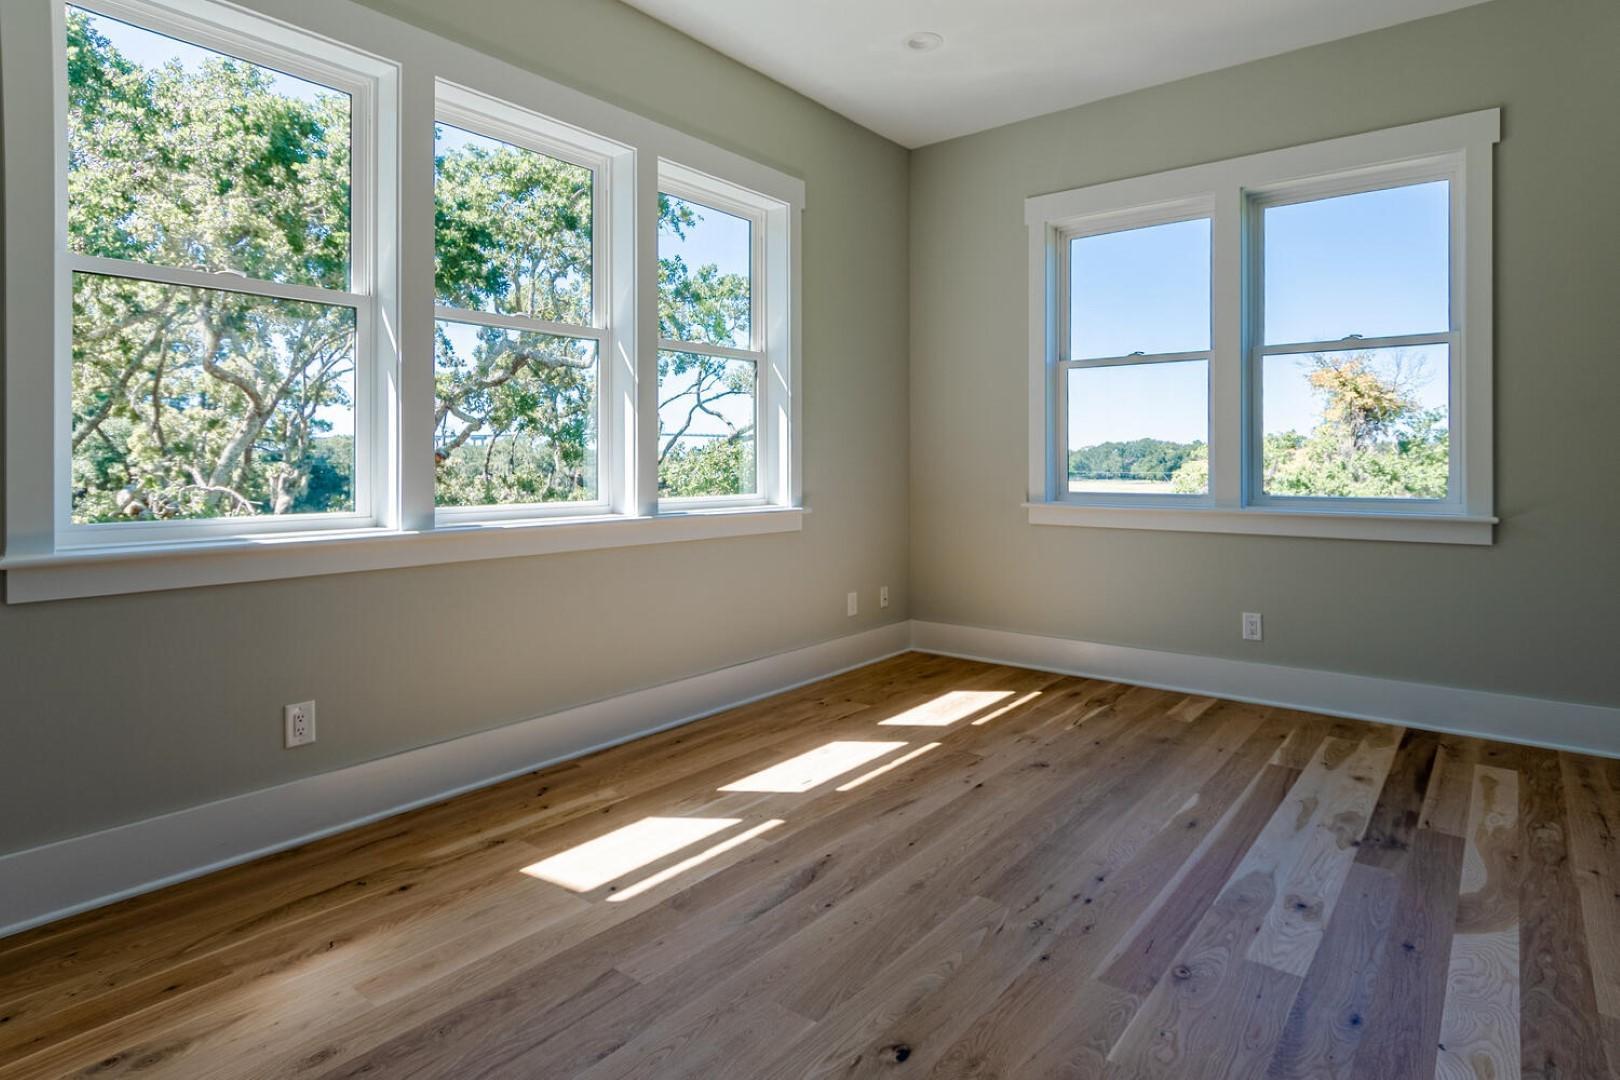 Scanlonville Homes For Sale - 156 5th, Mount Pleasant, SC - 42